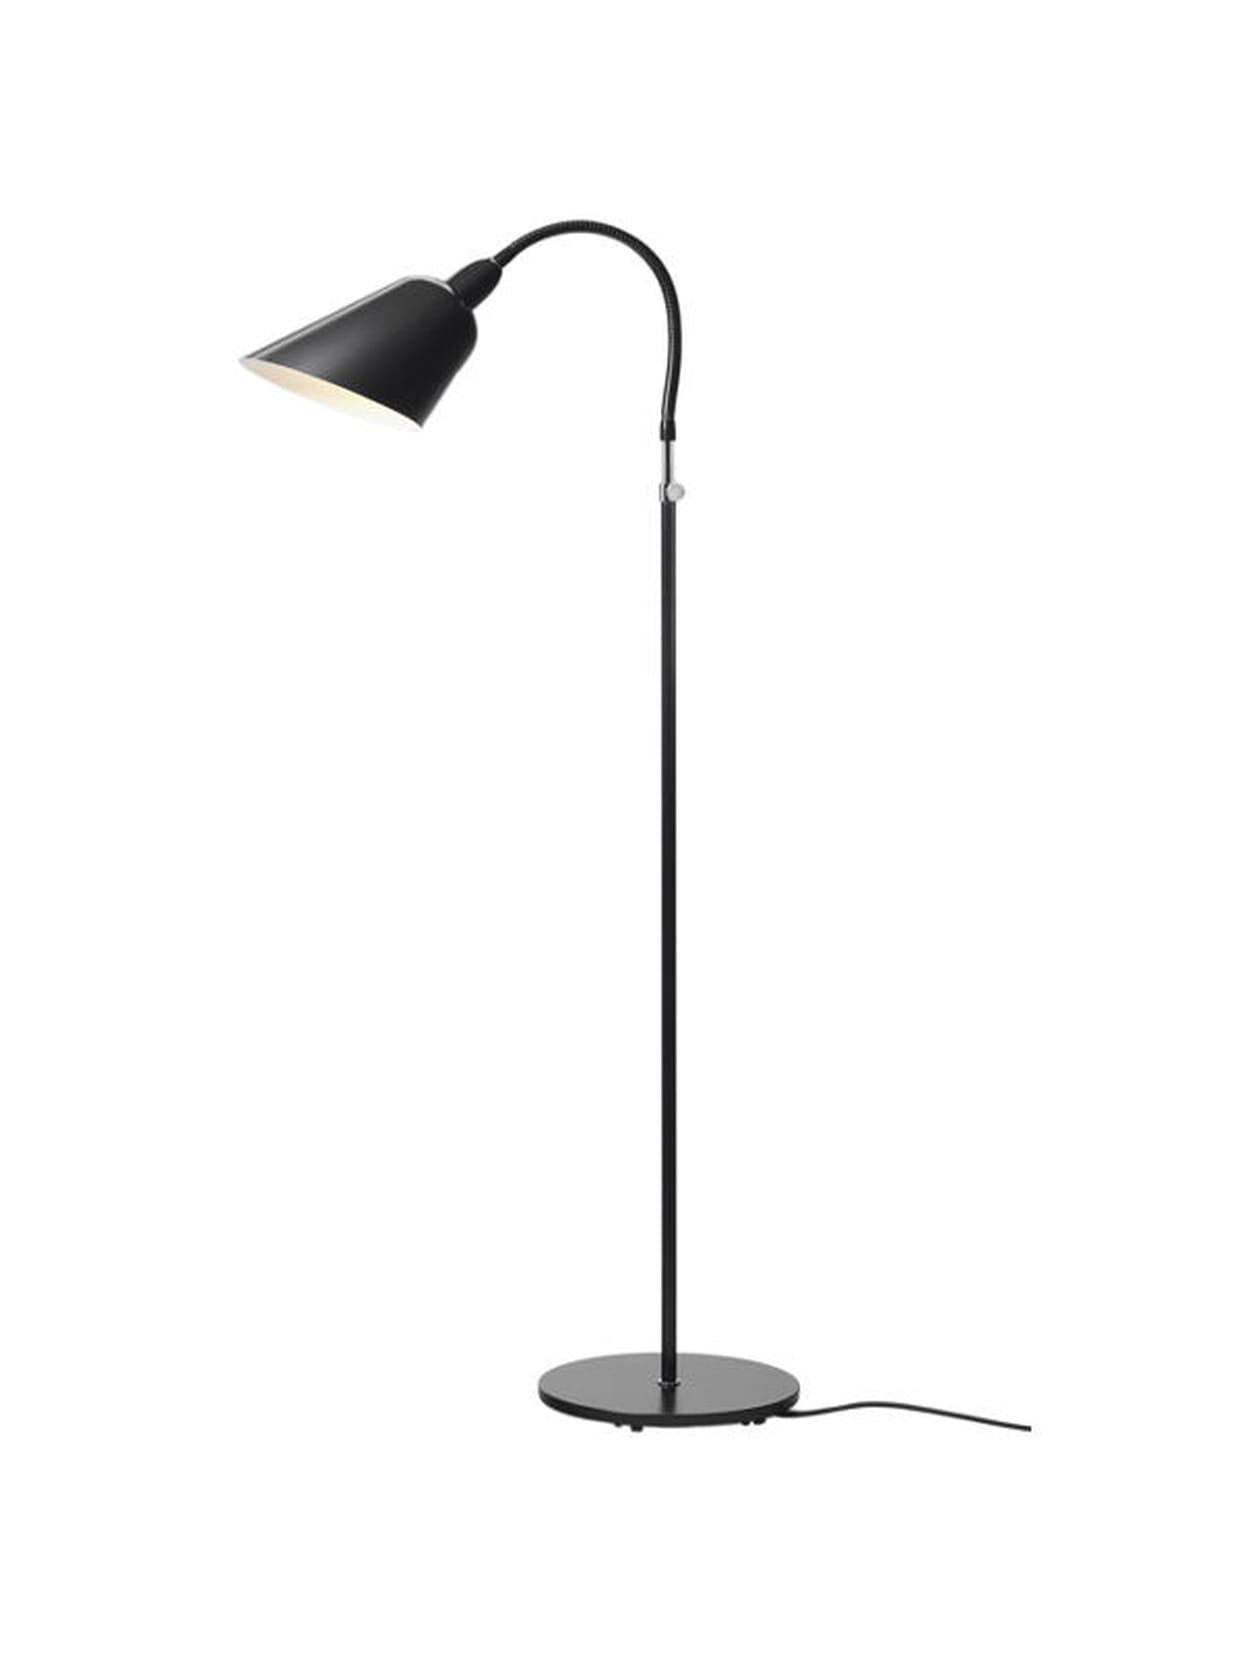 lampadaire bellevue aj2 chez the collection. Black Bedroom Furniture Sets. Home Design Ideas